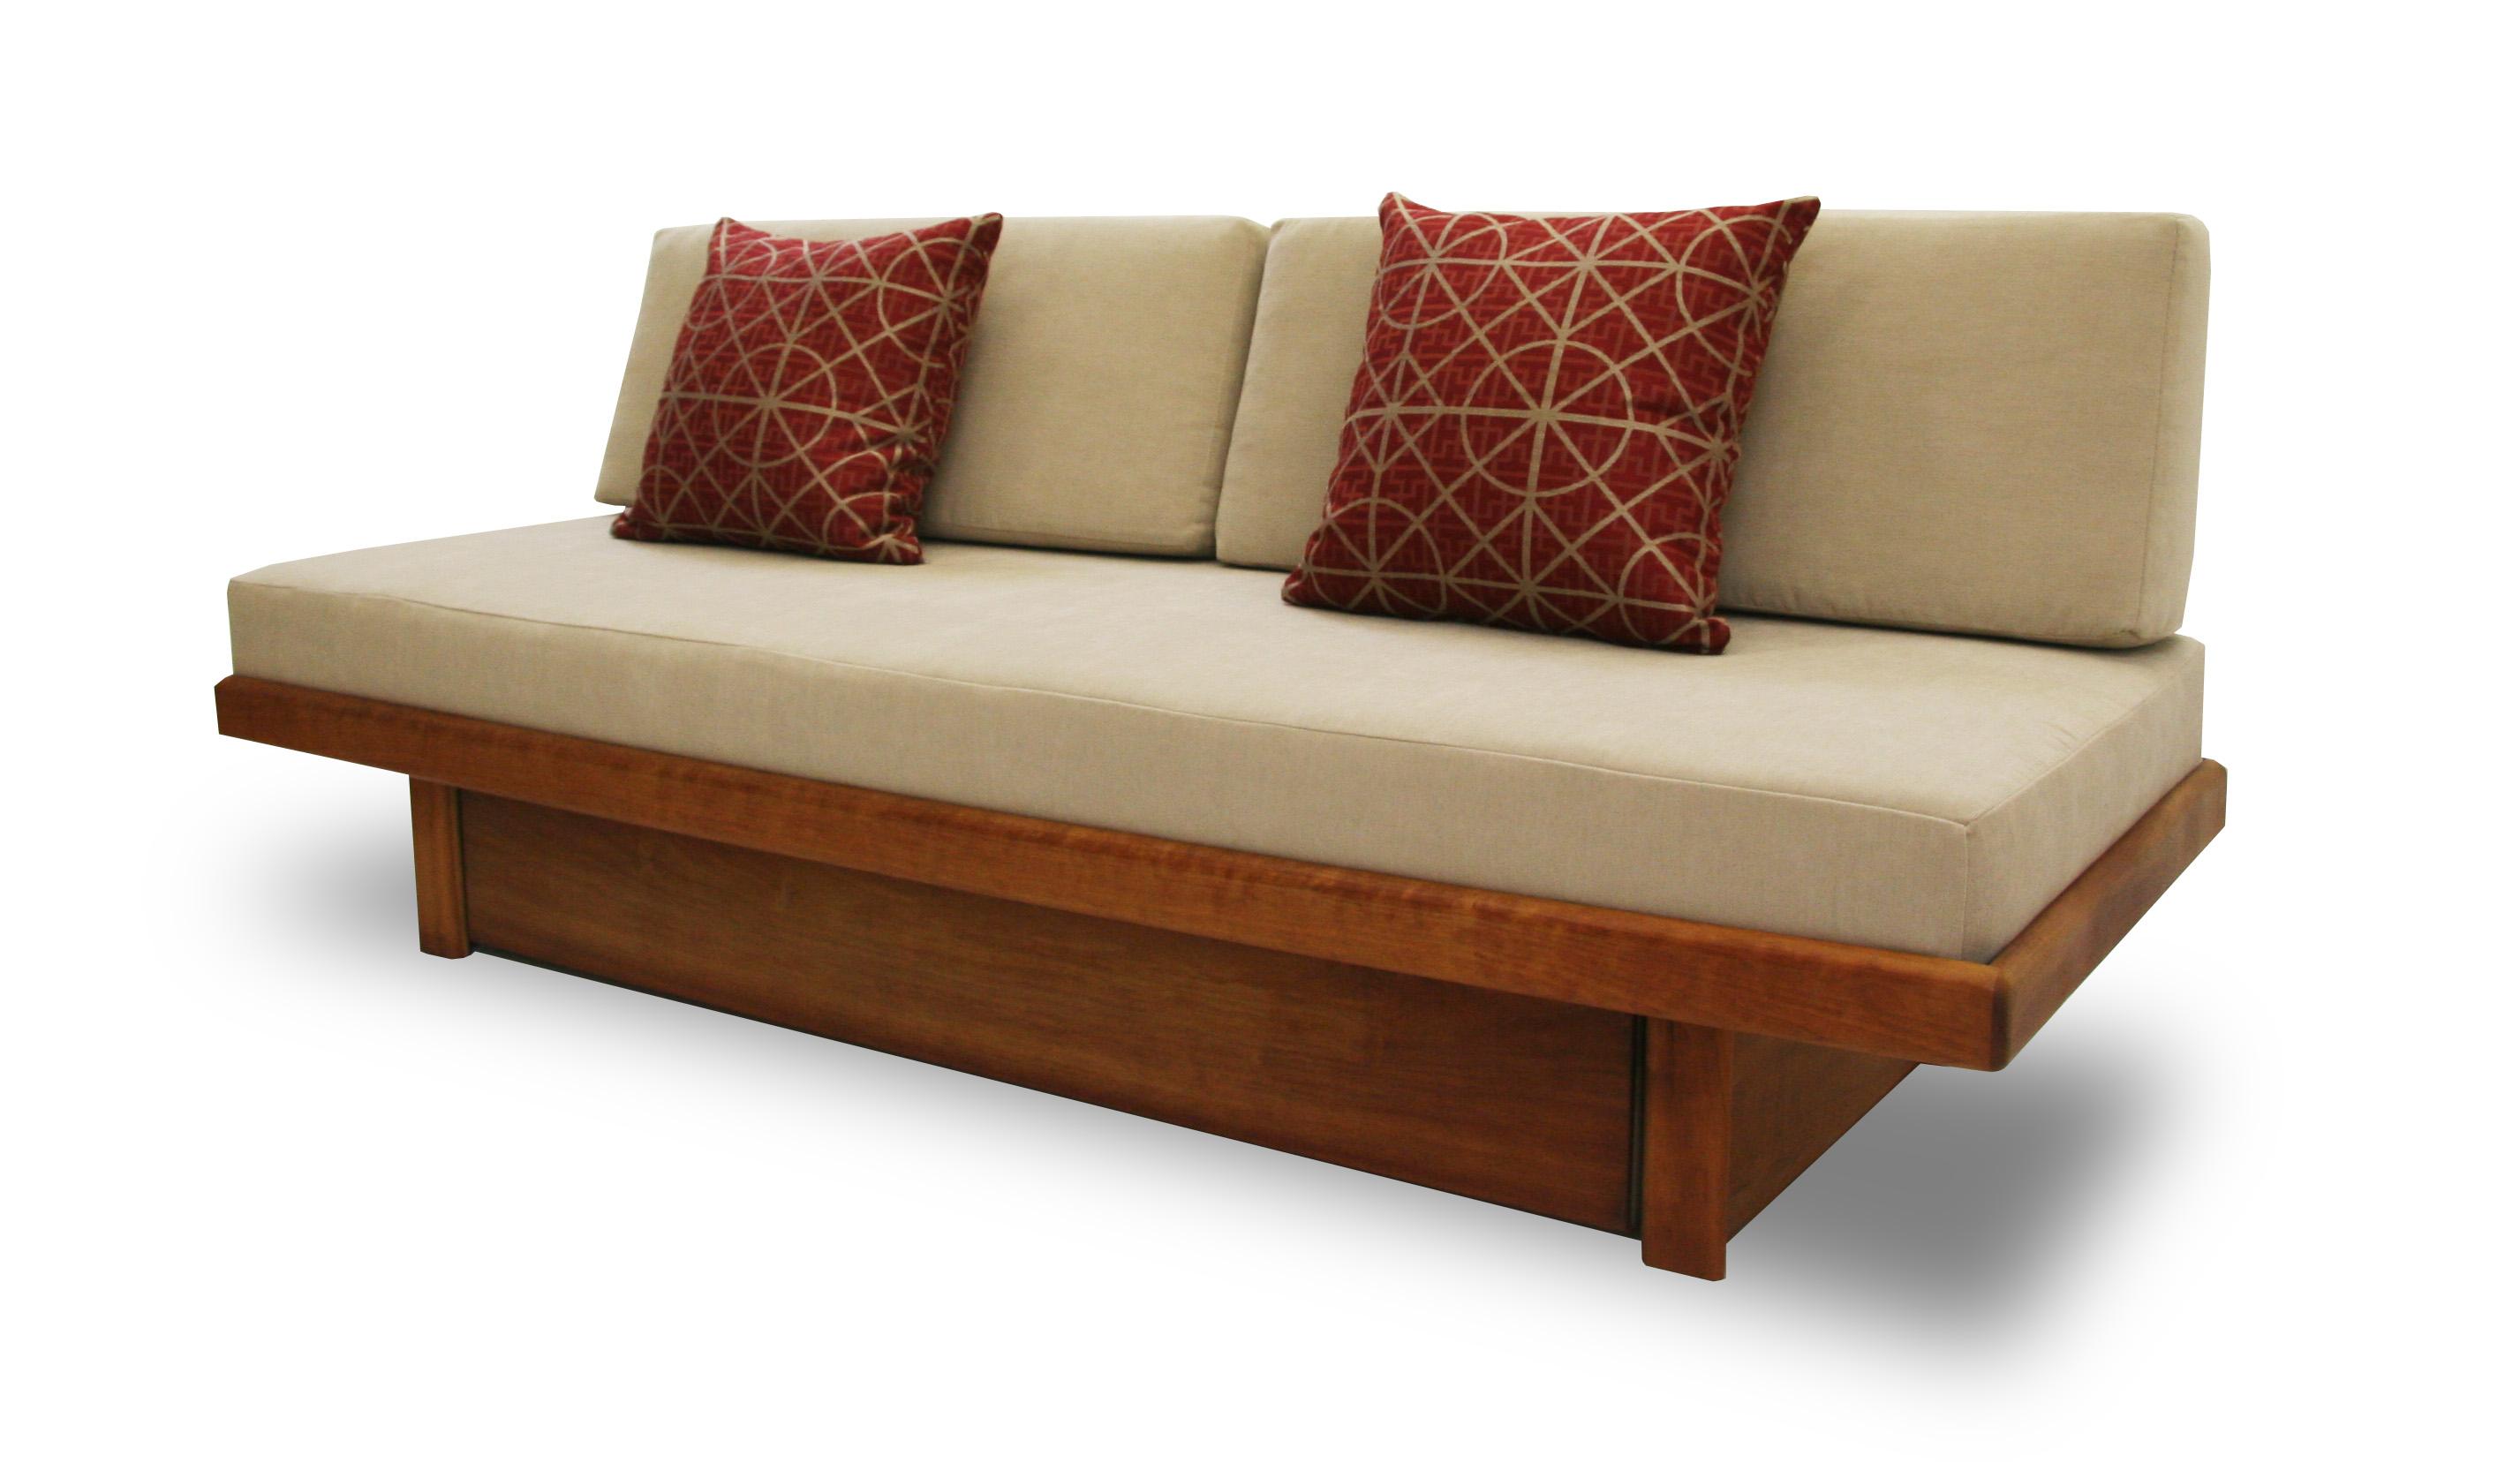 Mondrian Storage Daybed Couch